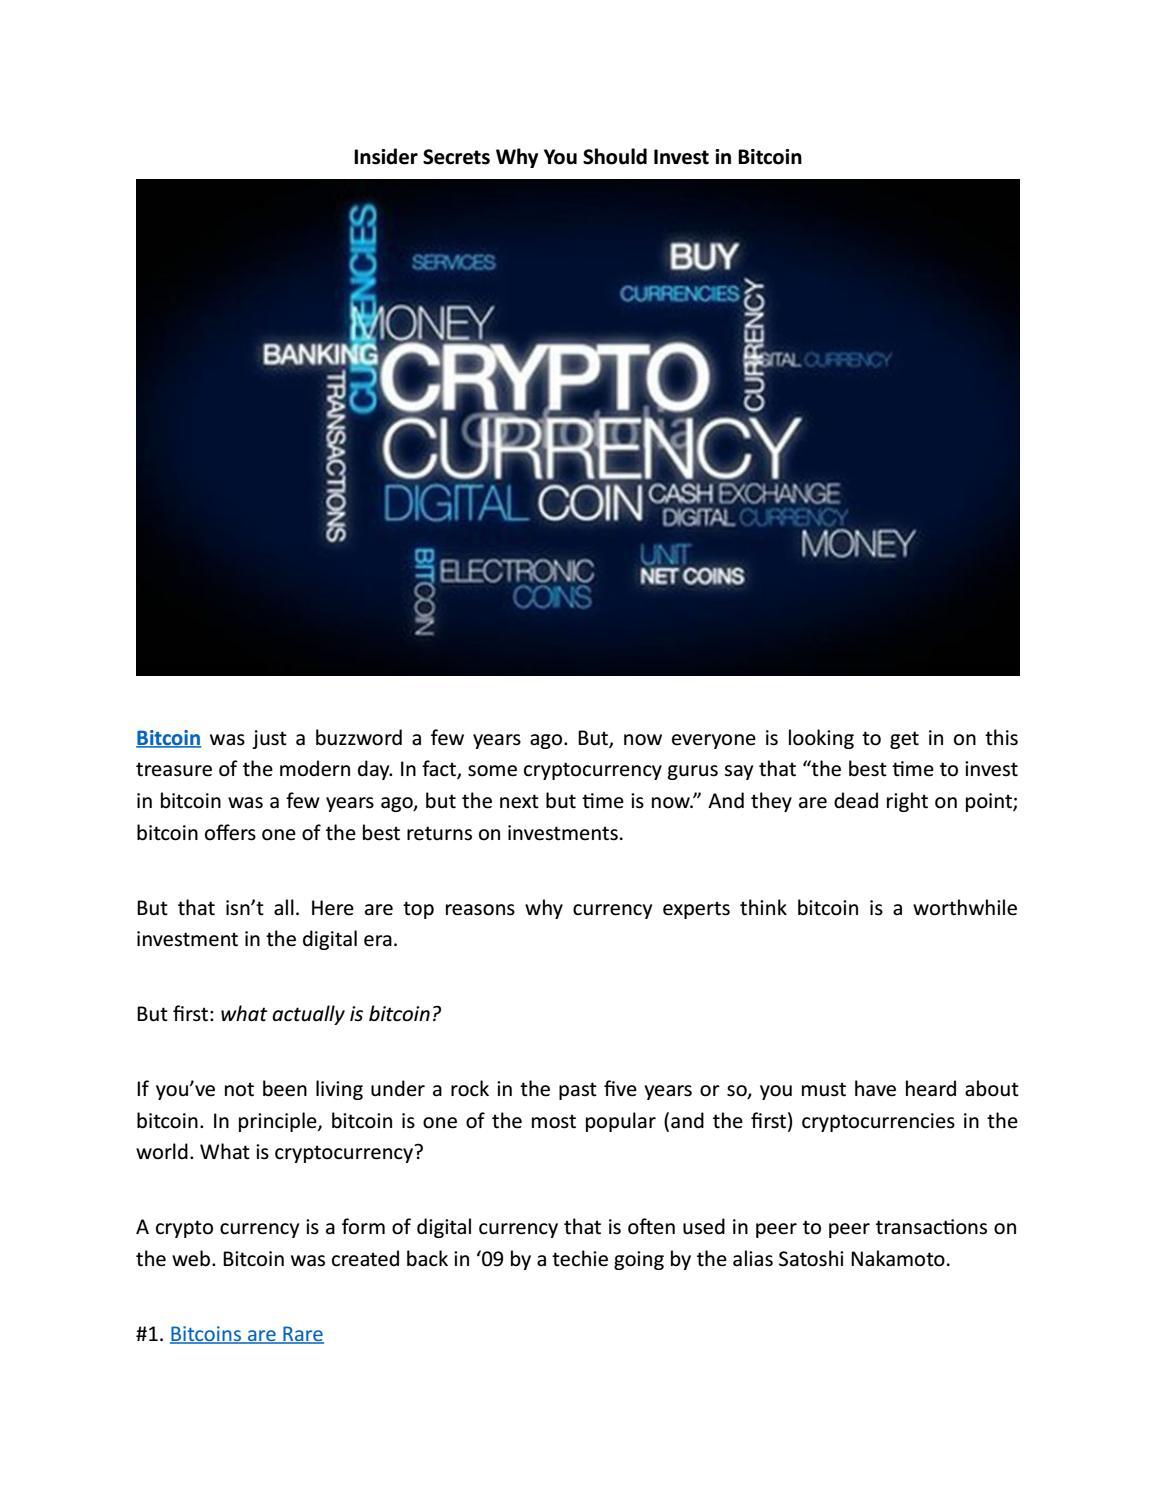 cryptocurrency insider secrets